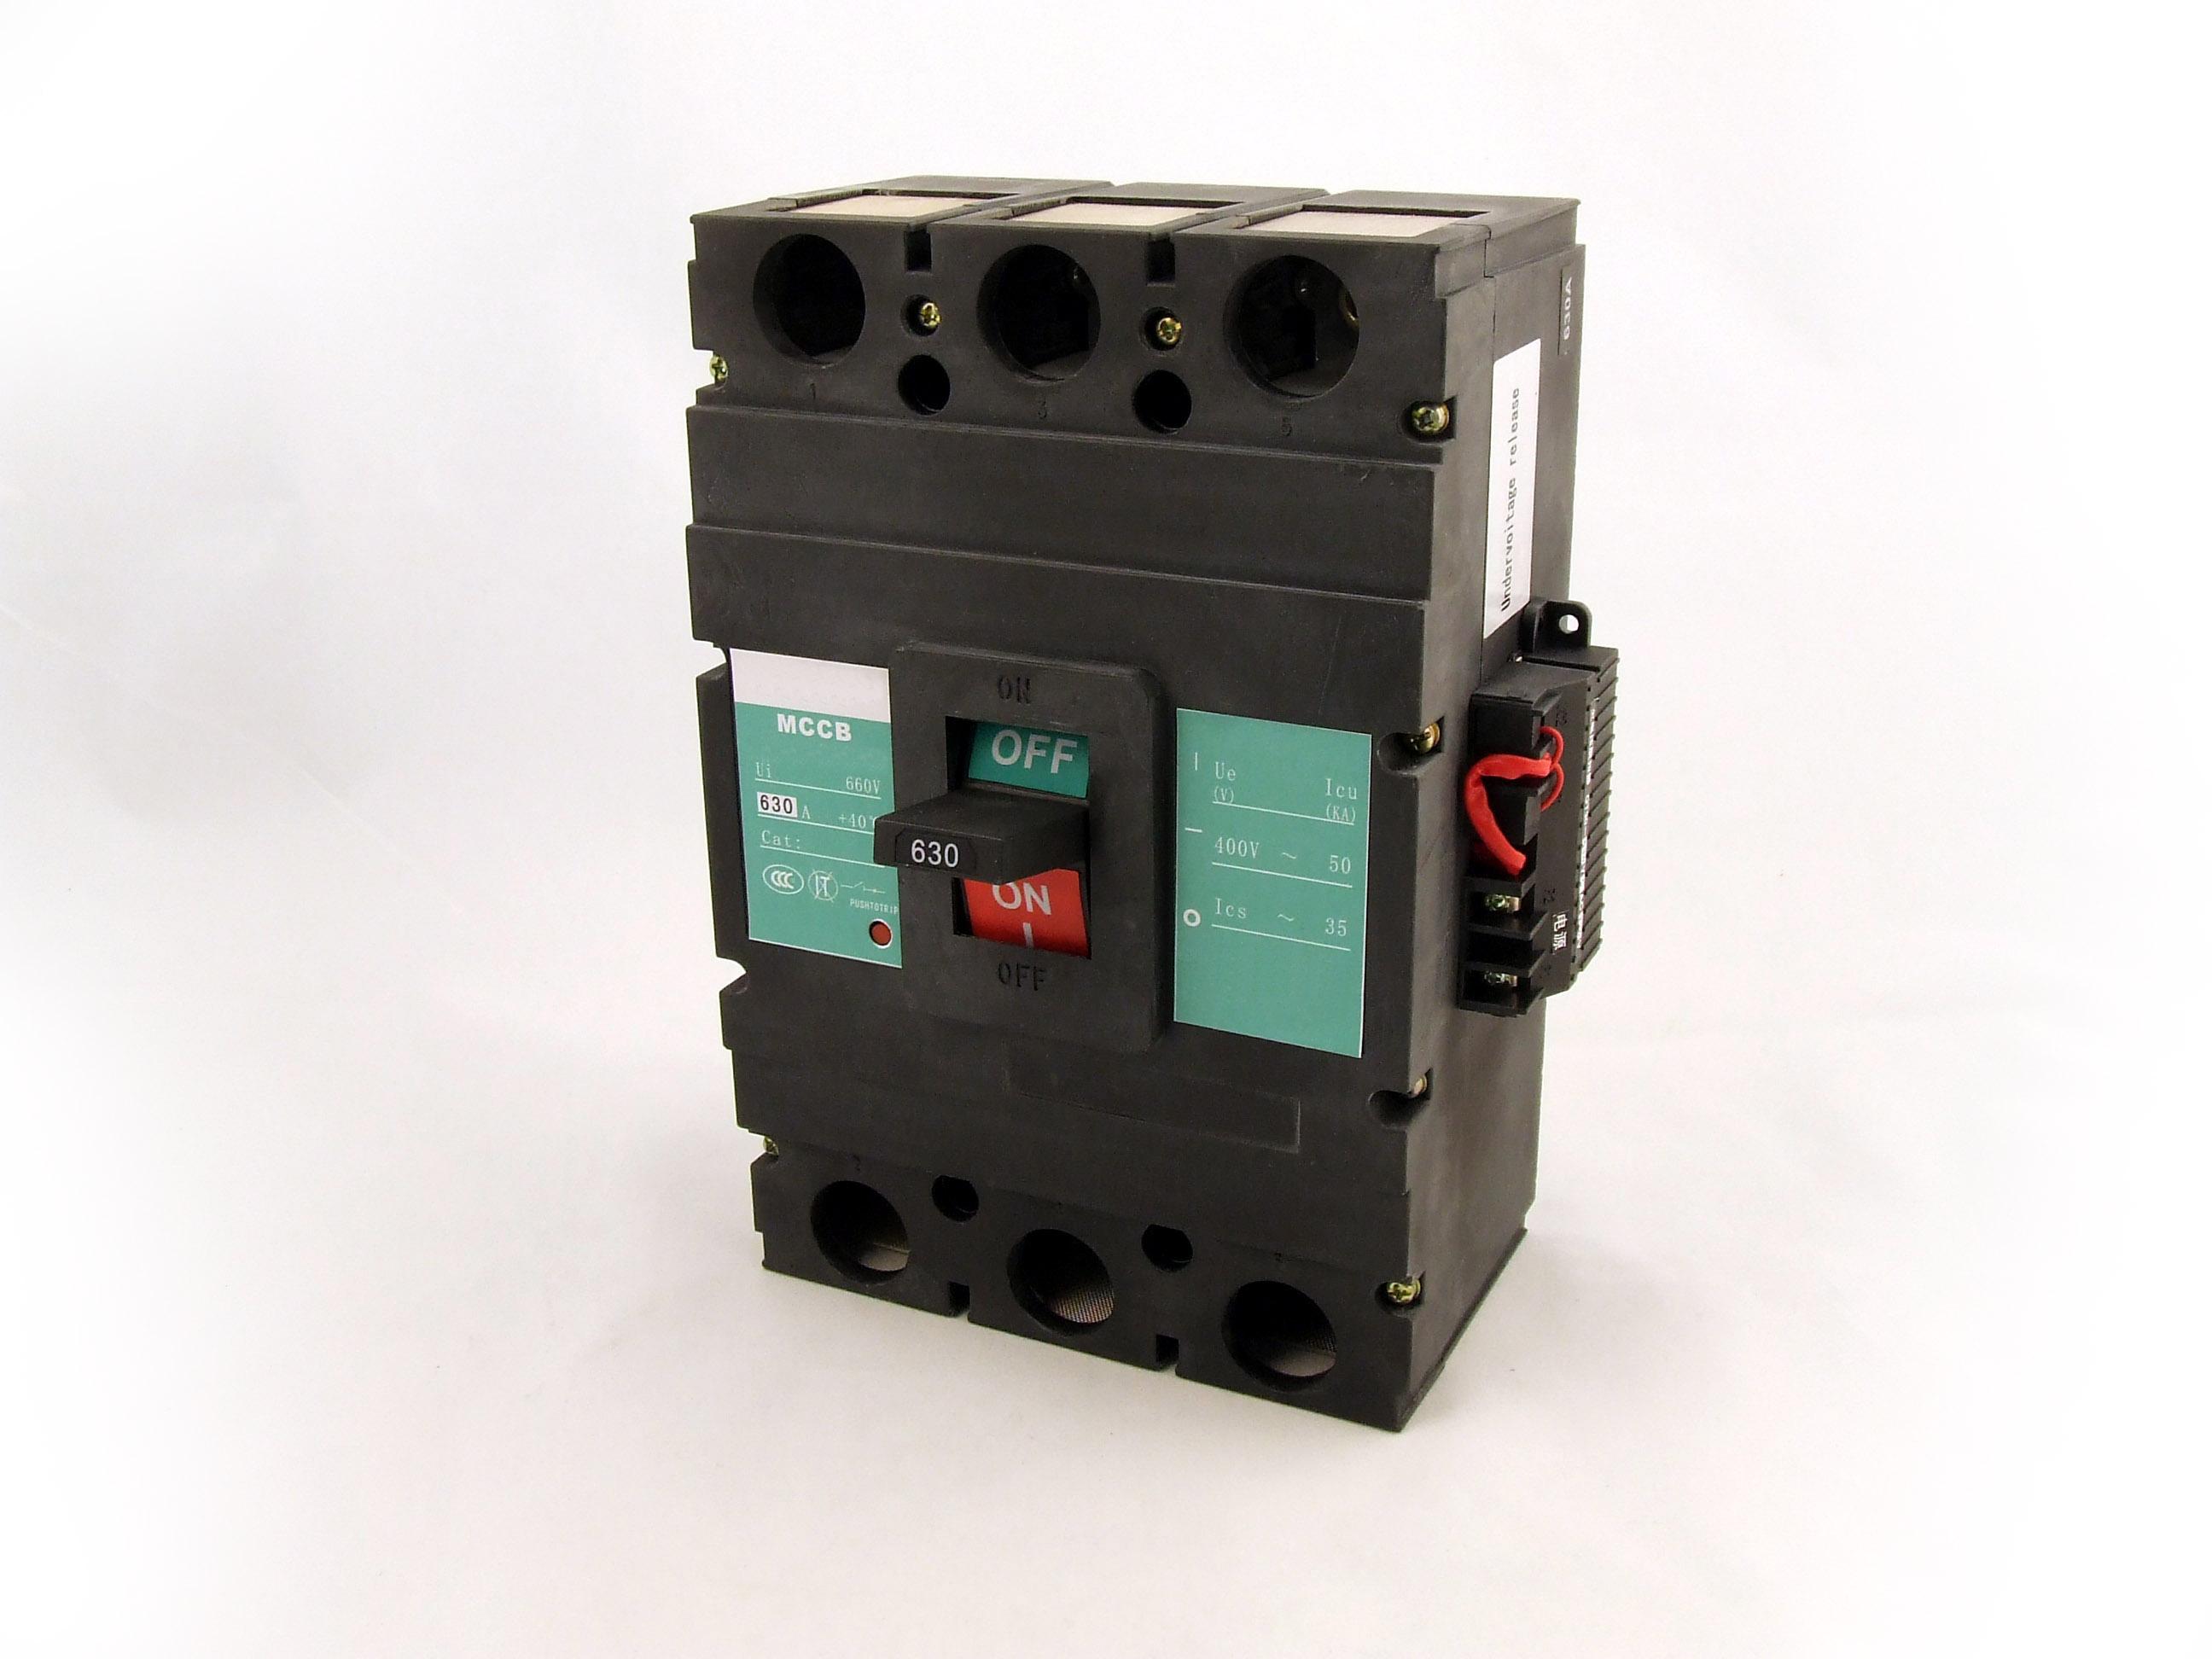 circuit breaker induction furnace spare parts. Black Bedroom Furniture Sets. Home Design Ideas